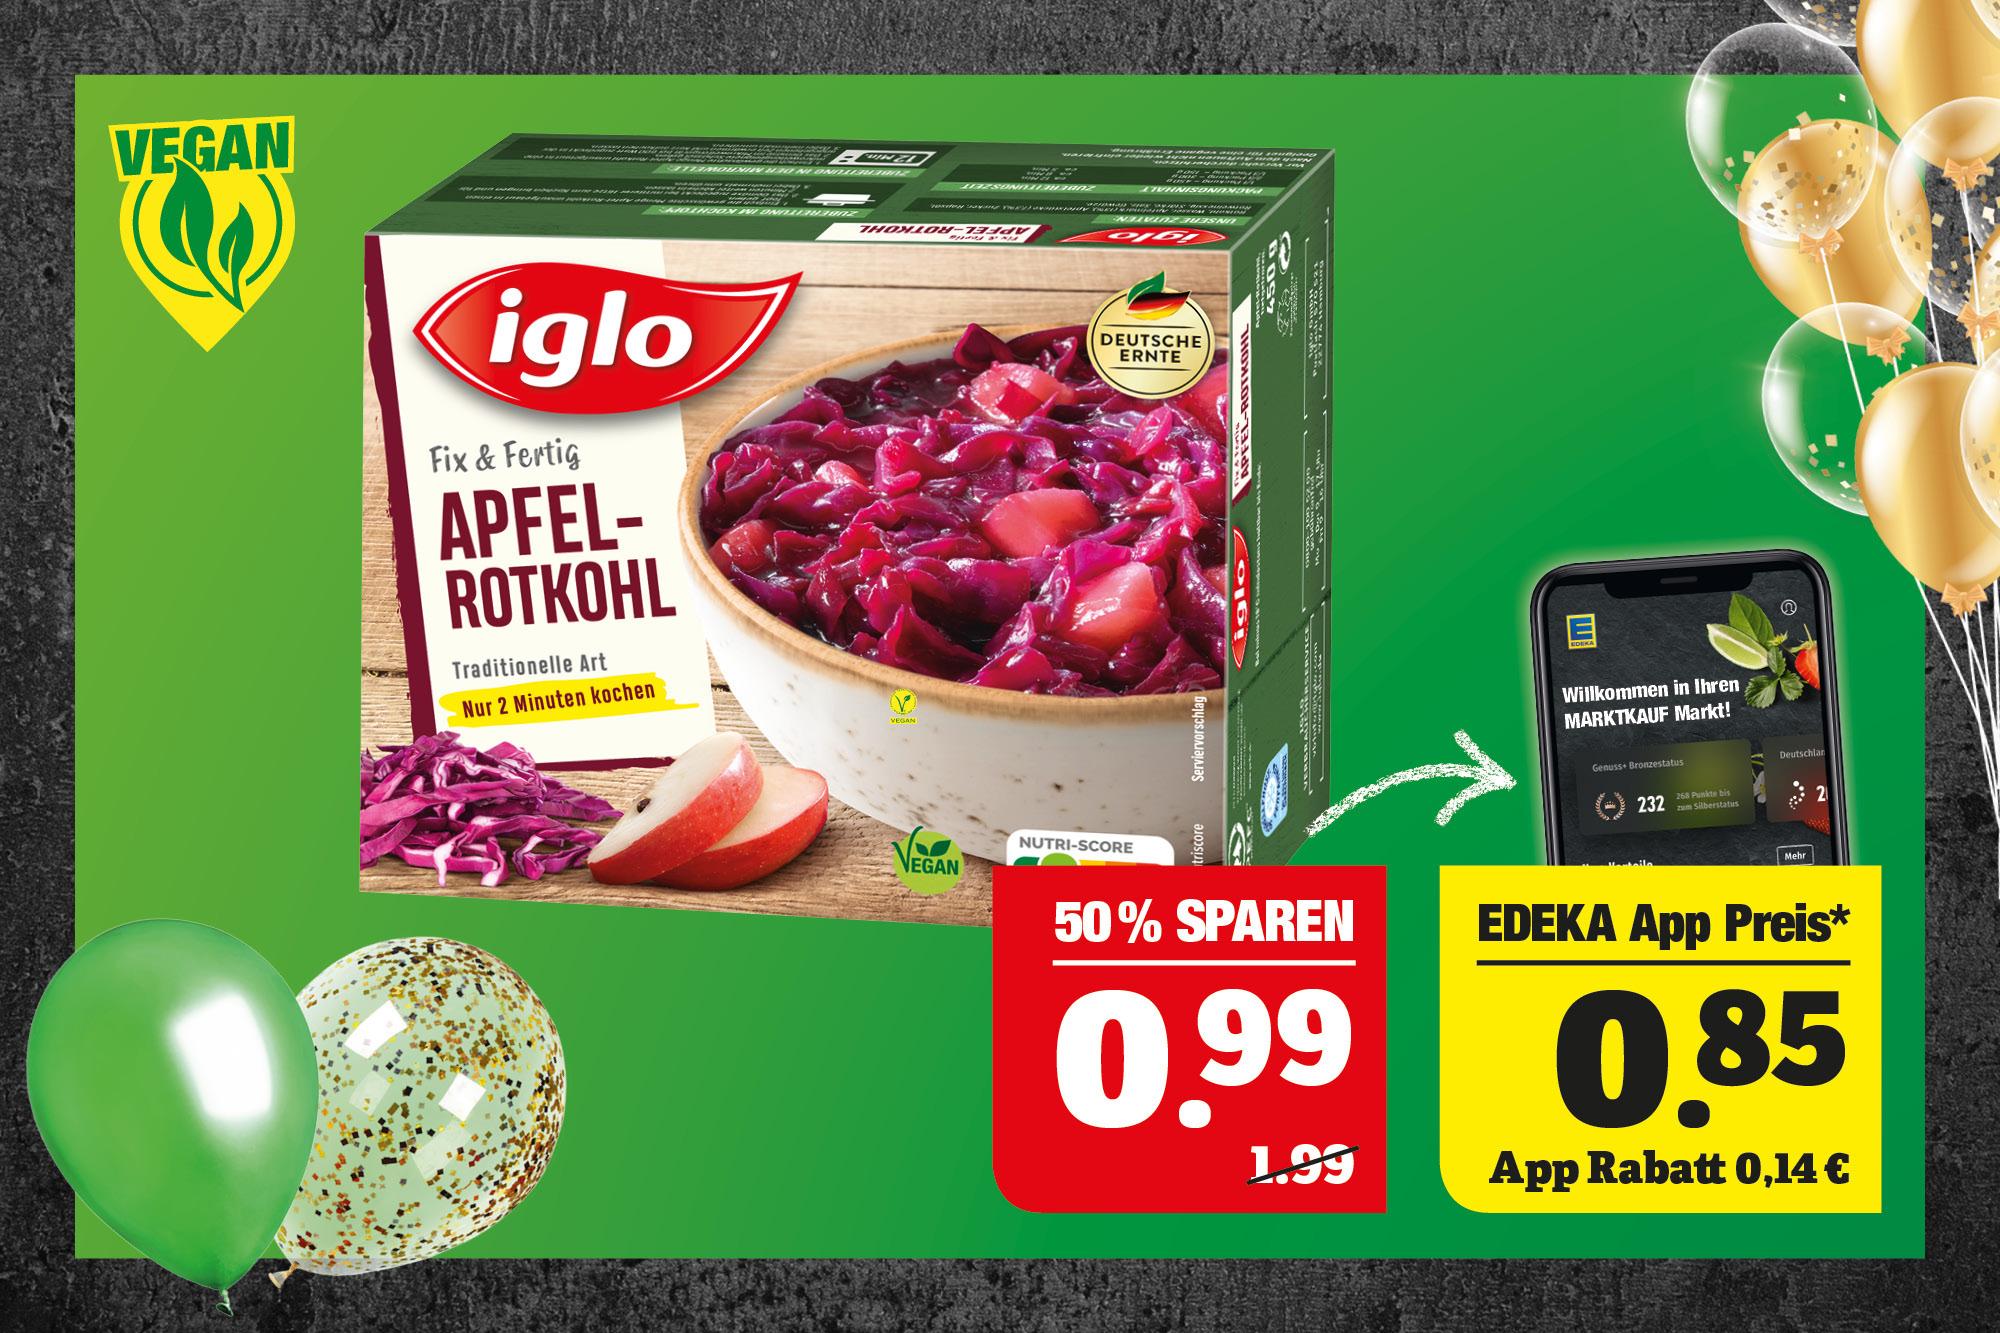 iglo Apfel-Rotkohl - Traditionelle Art; vegan; tiefgefroren; 450g Packung; 1kg=2,20.